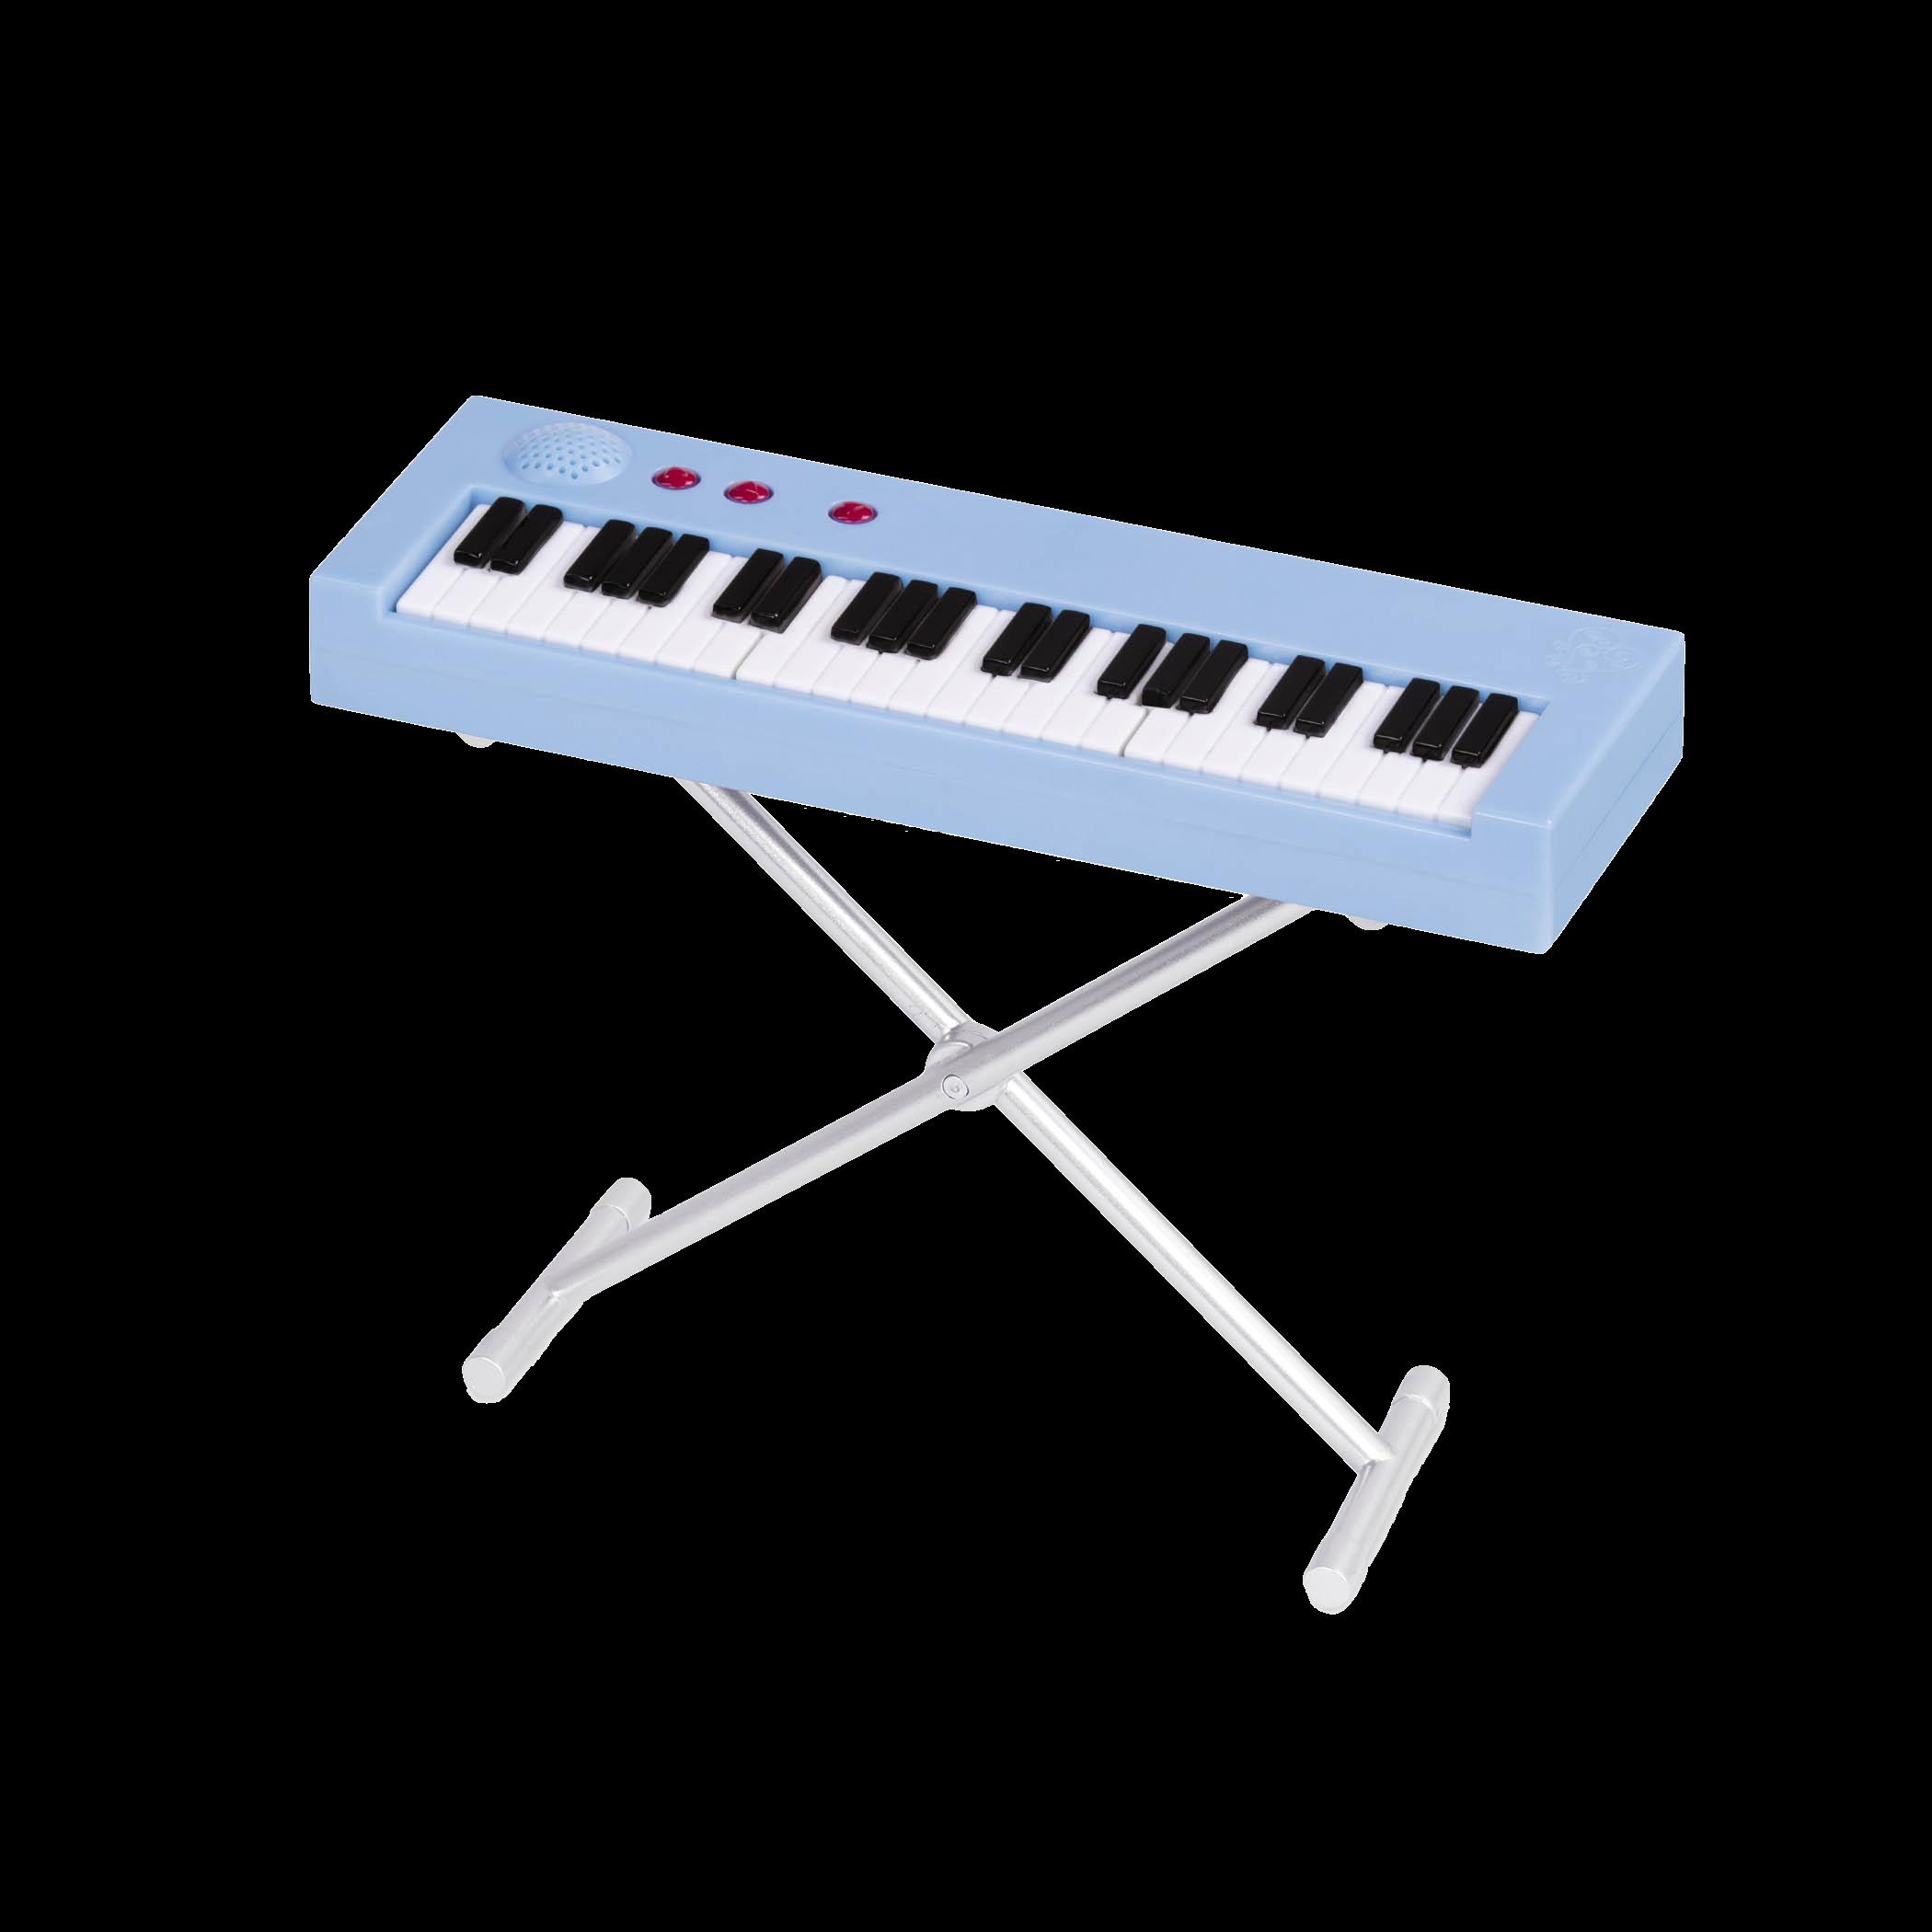 School Band Playset keyboard detail